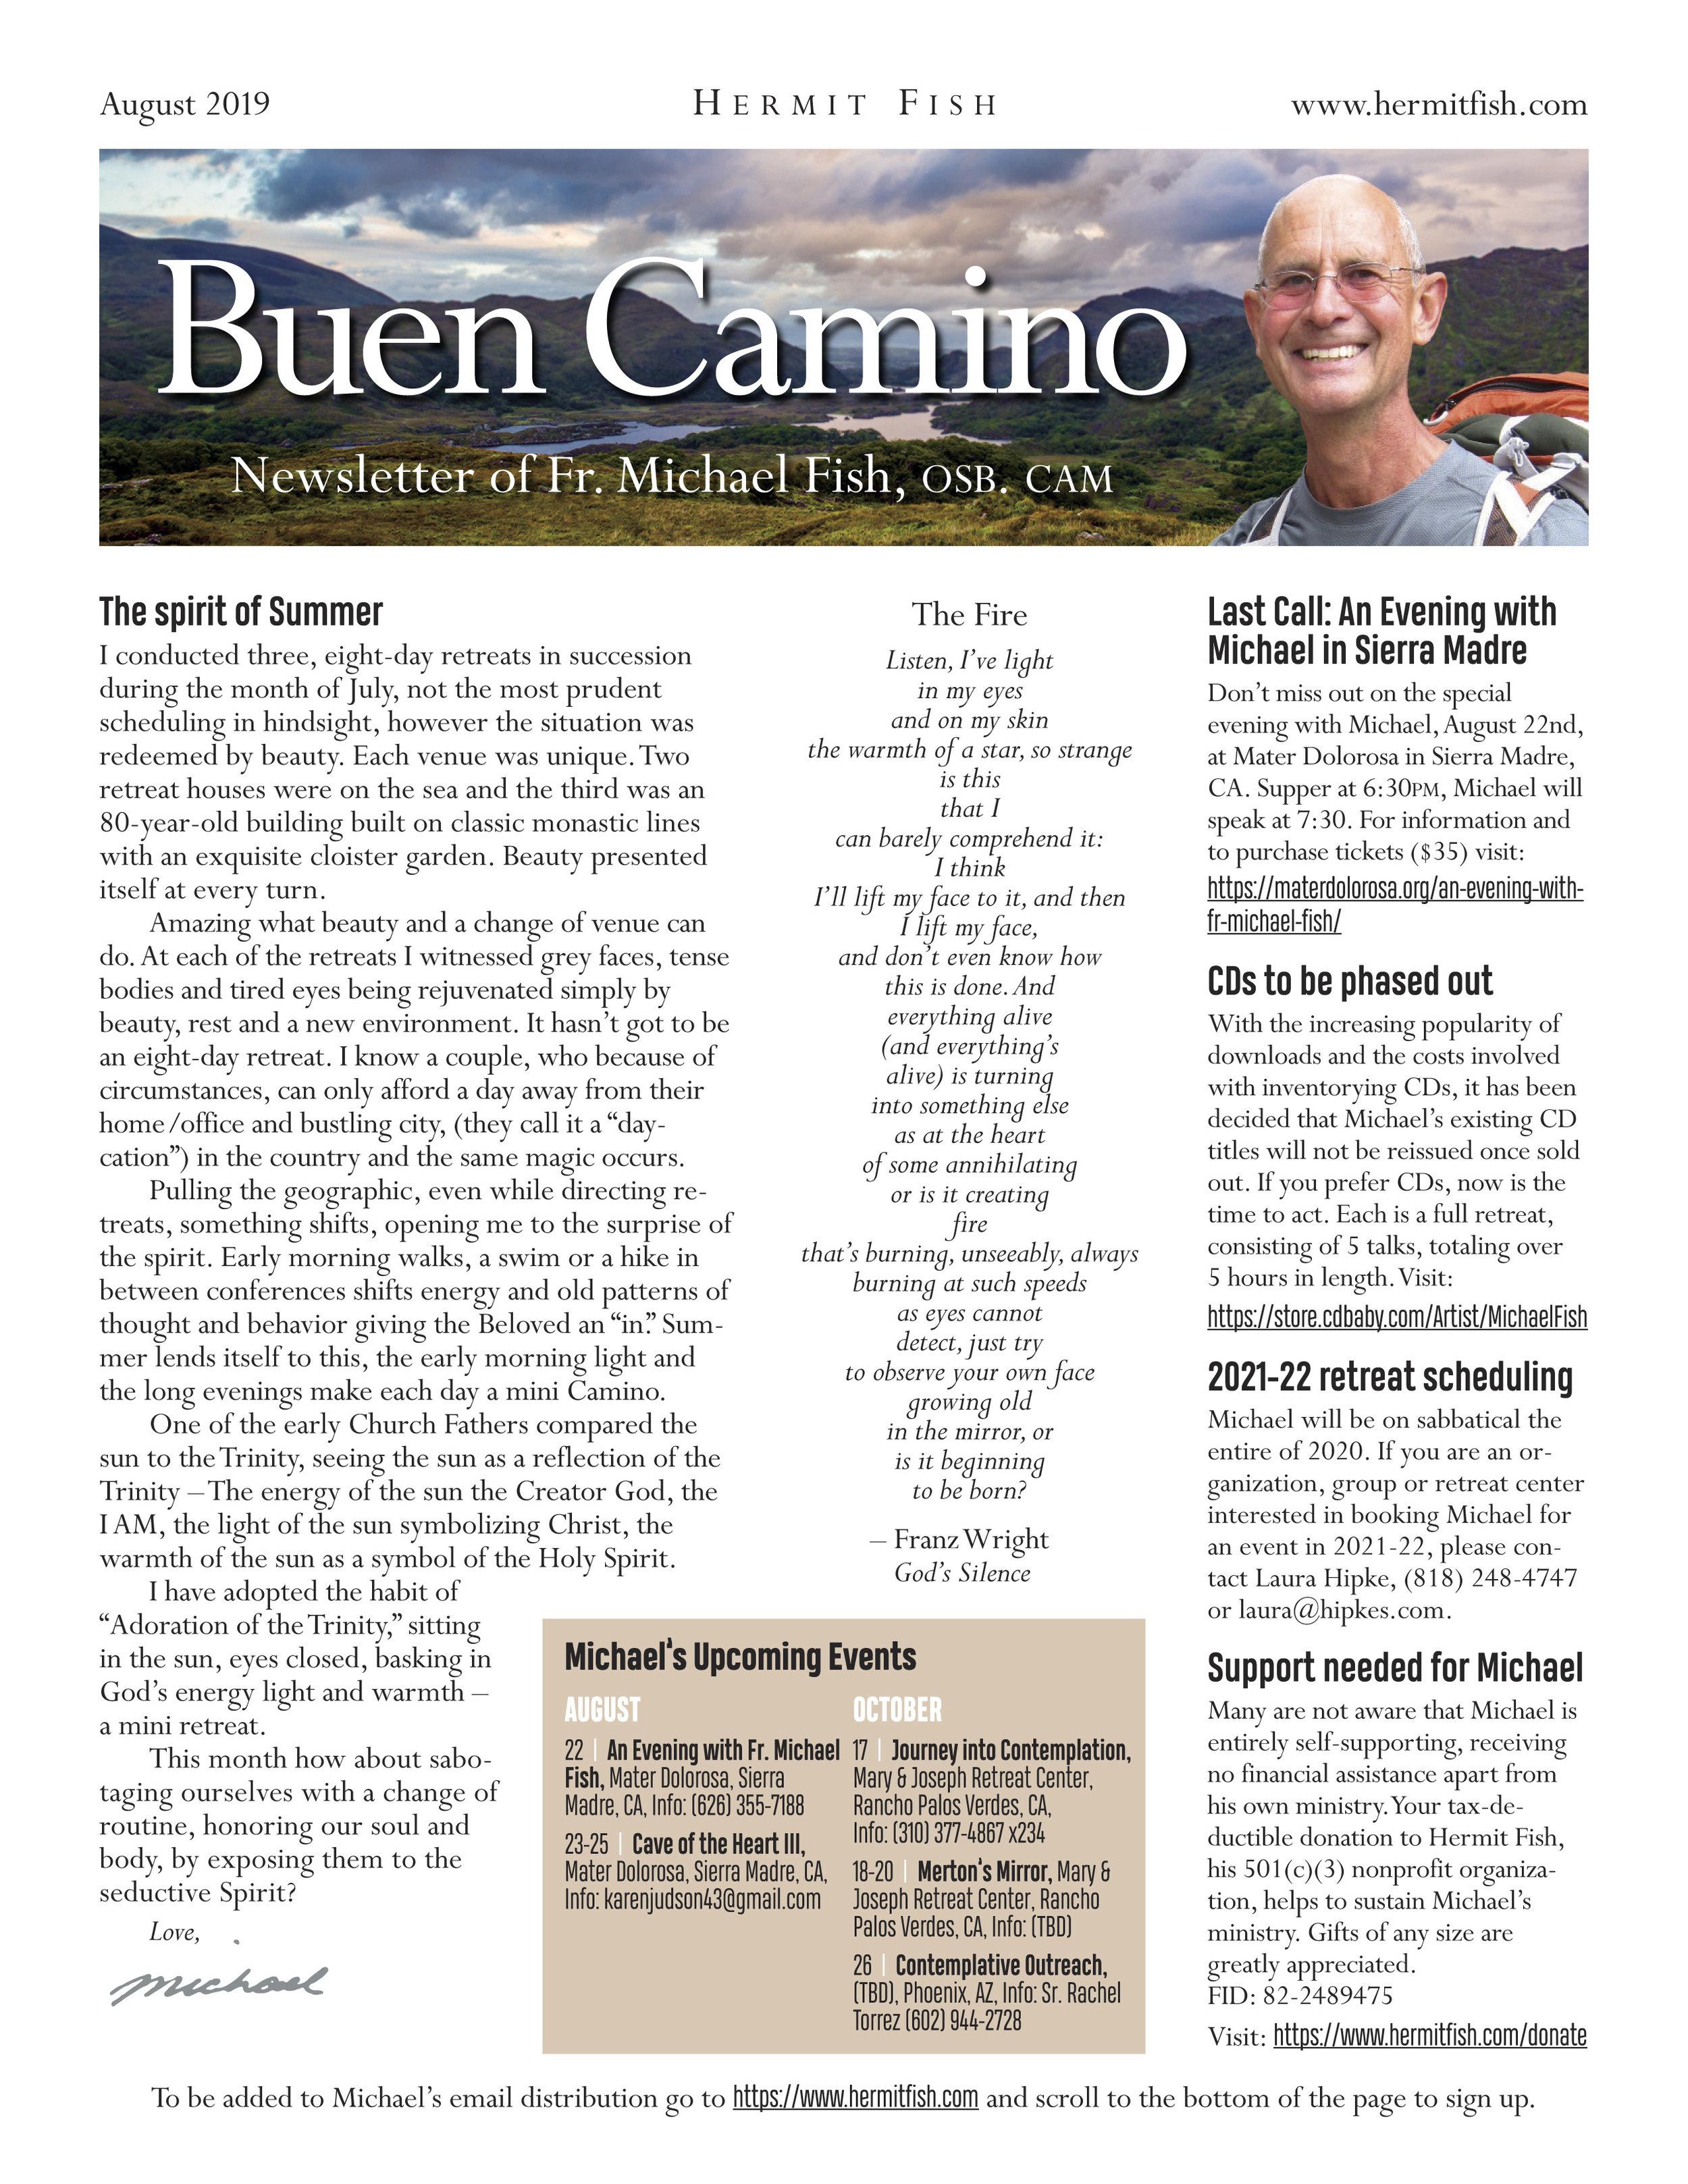 Buen Camino Aug 2019.jpg